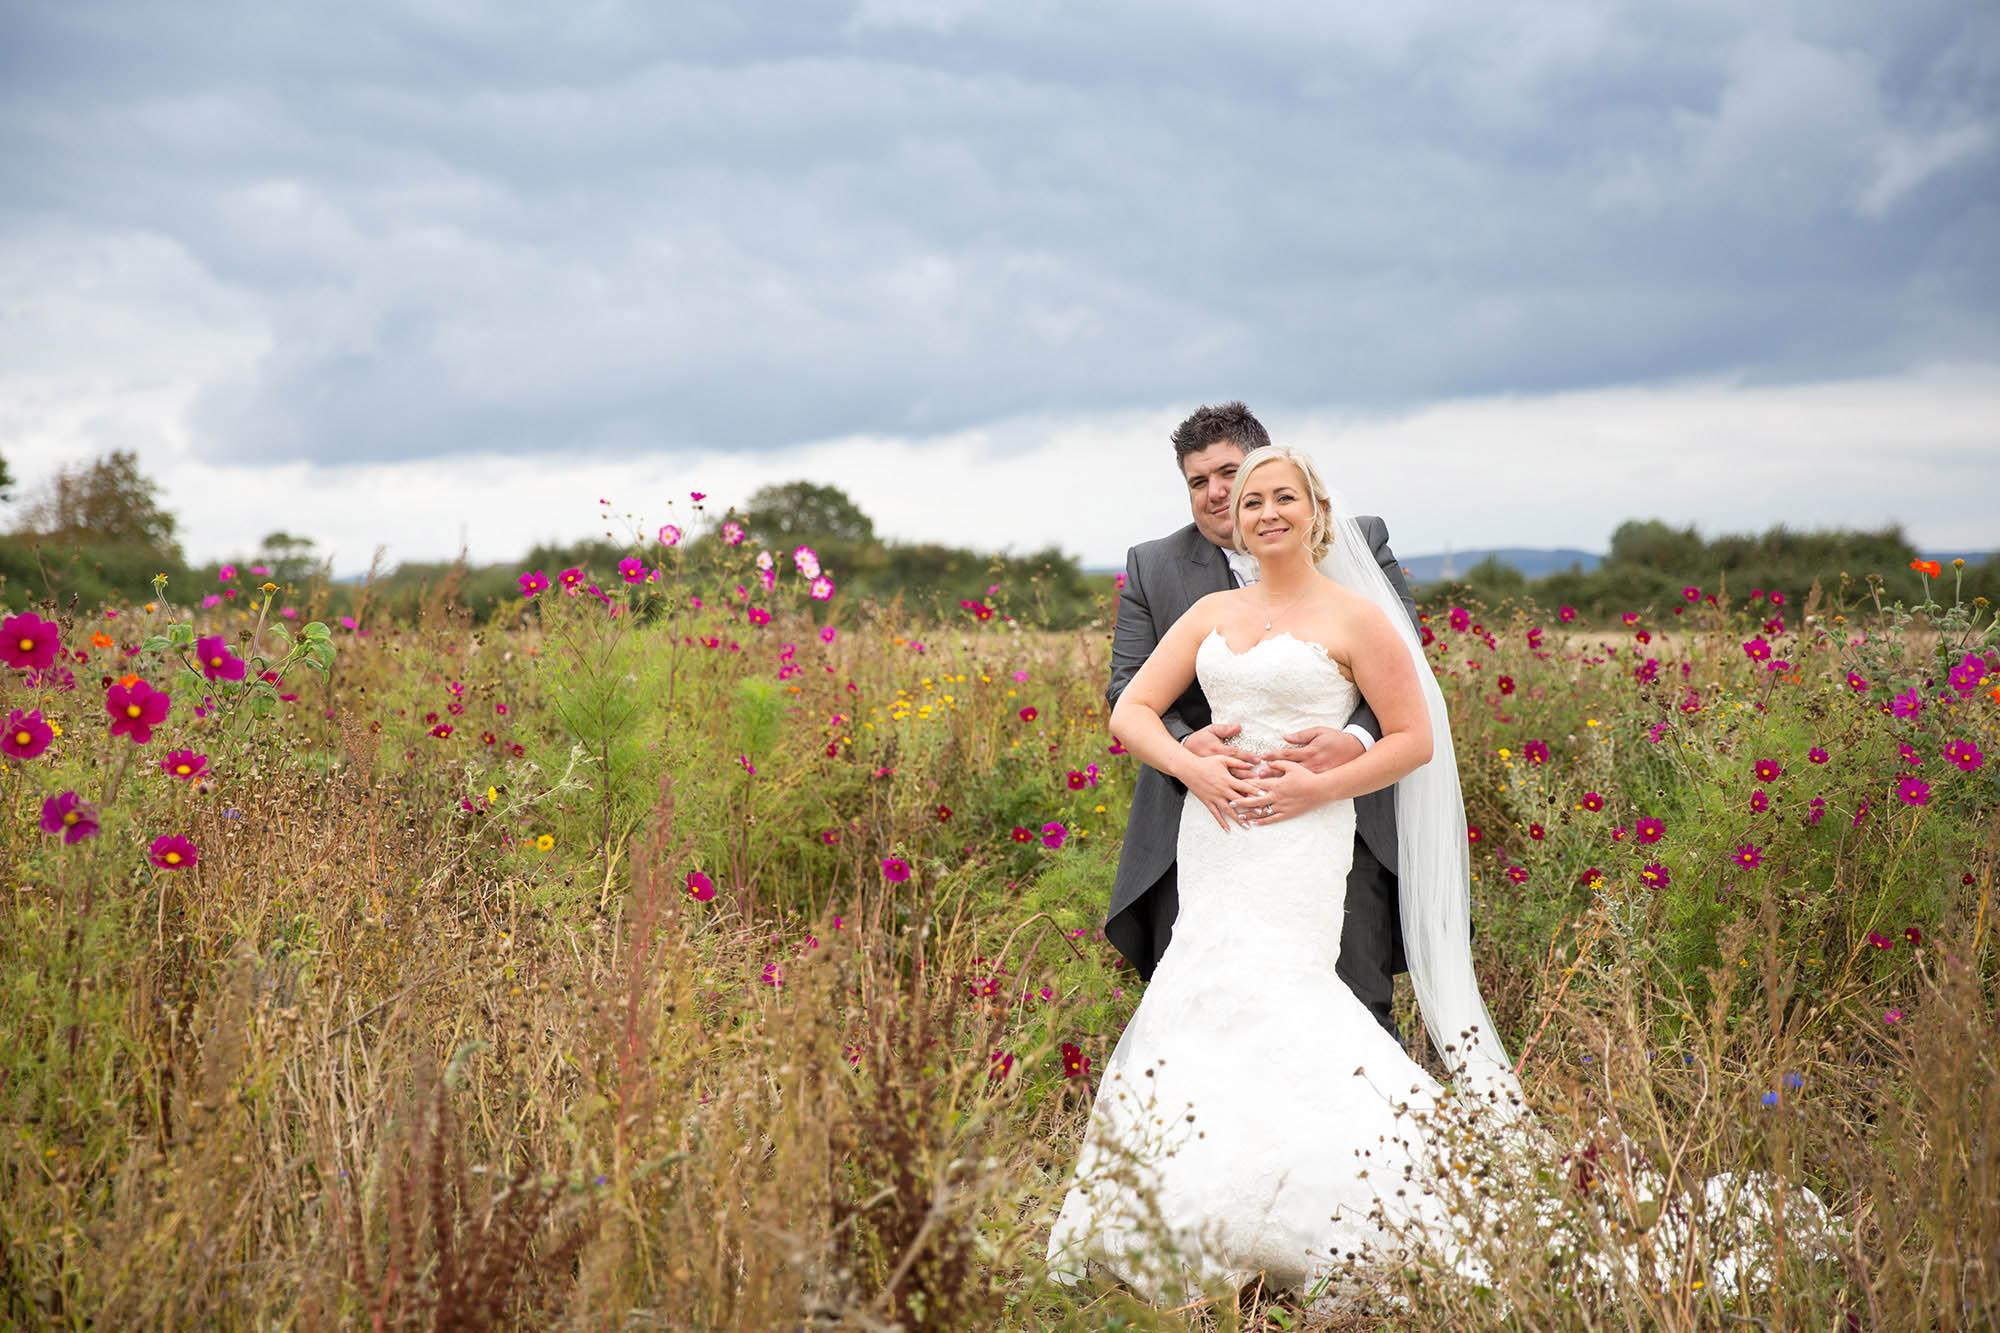 julia-toms-wedding-photographer-west-sussex-004.jpg